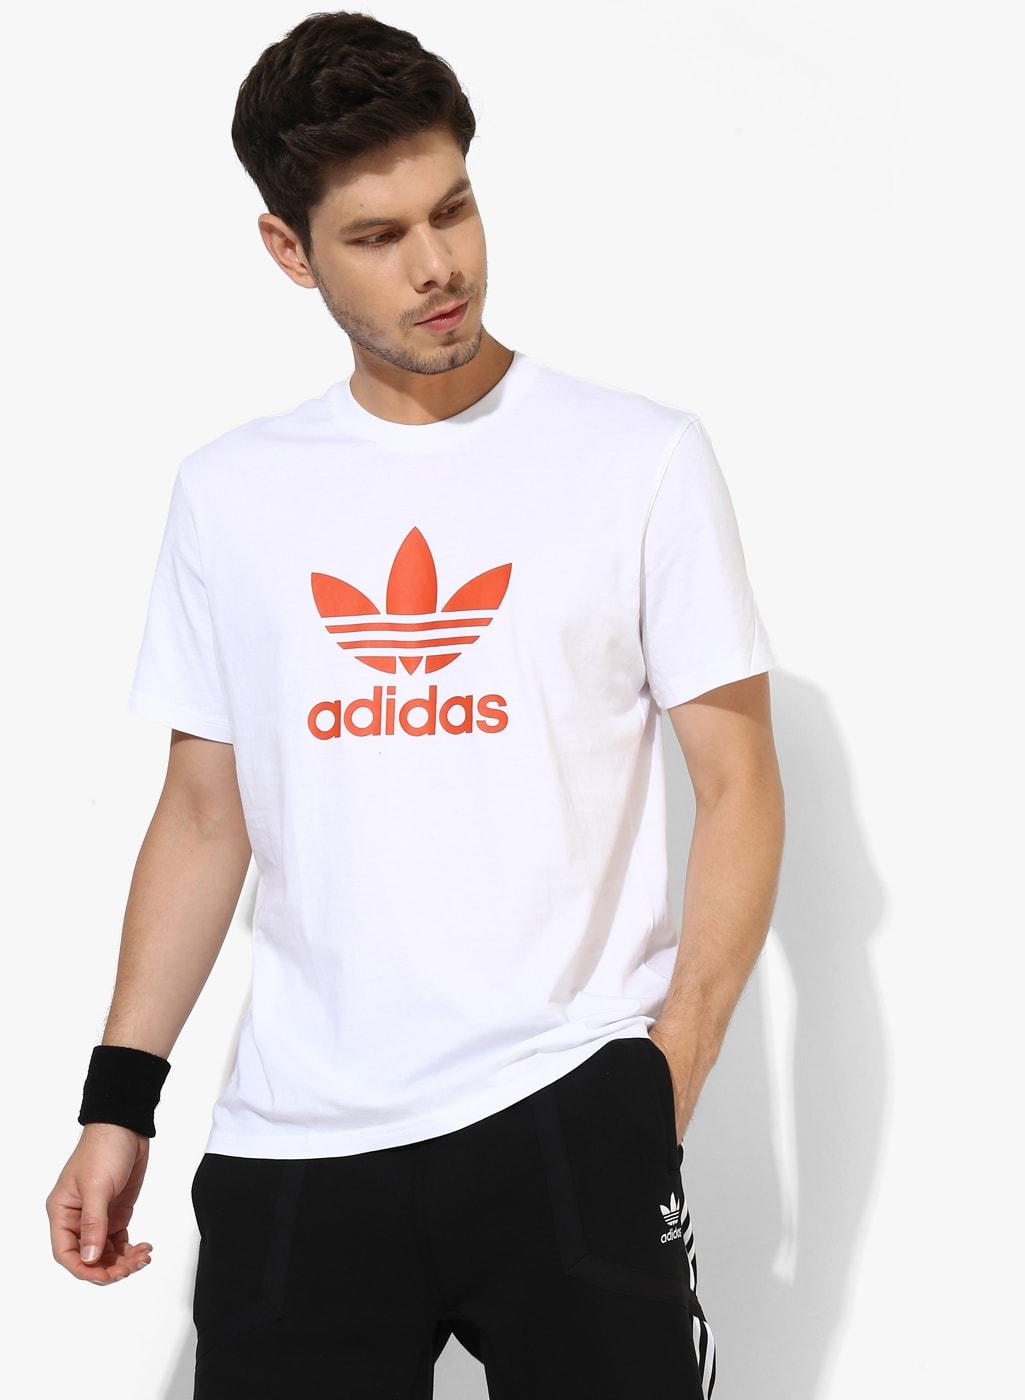 Adidas Trefoil Tshirts - Buy Adidas Trefoil Tshirts online in India 798194e8082a